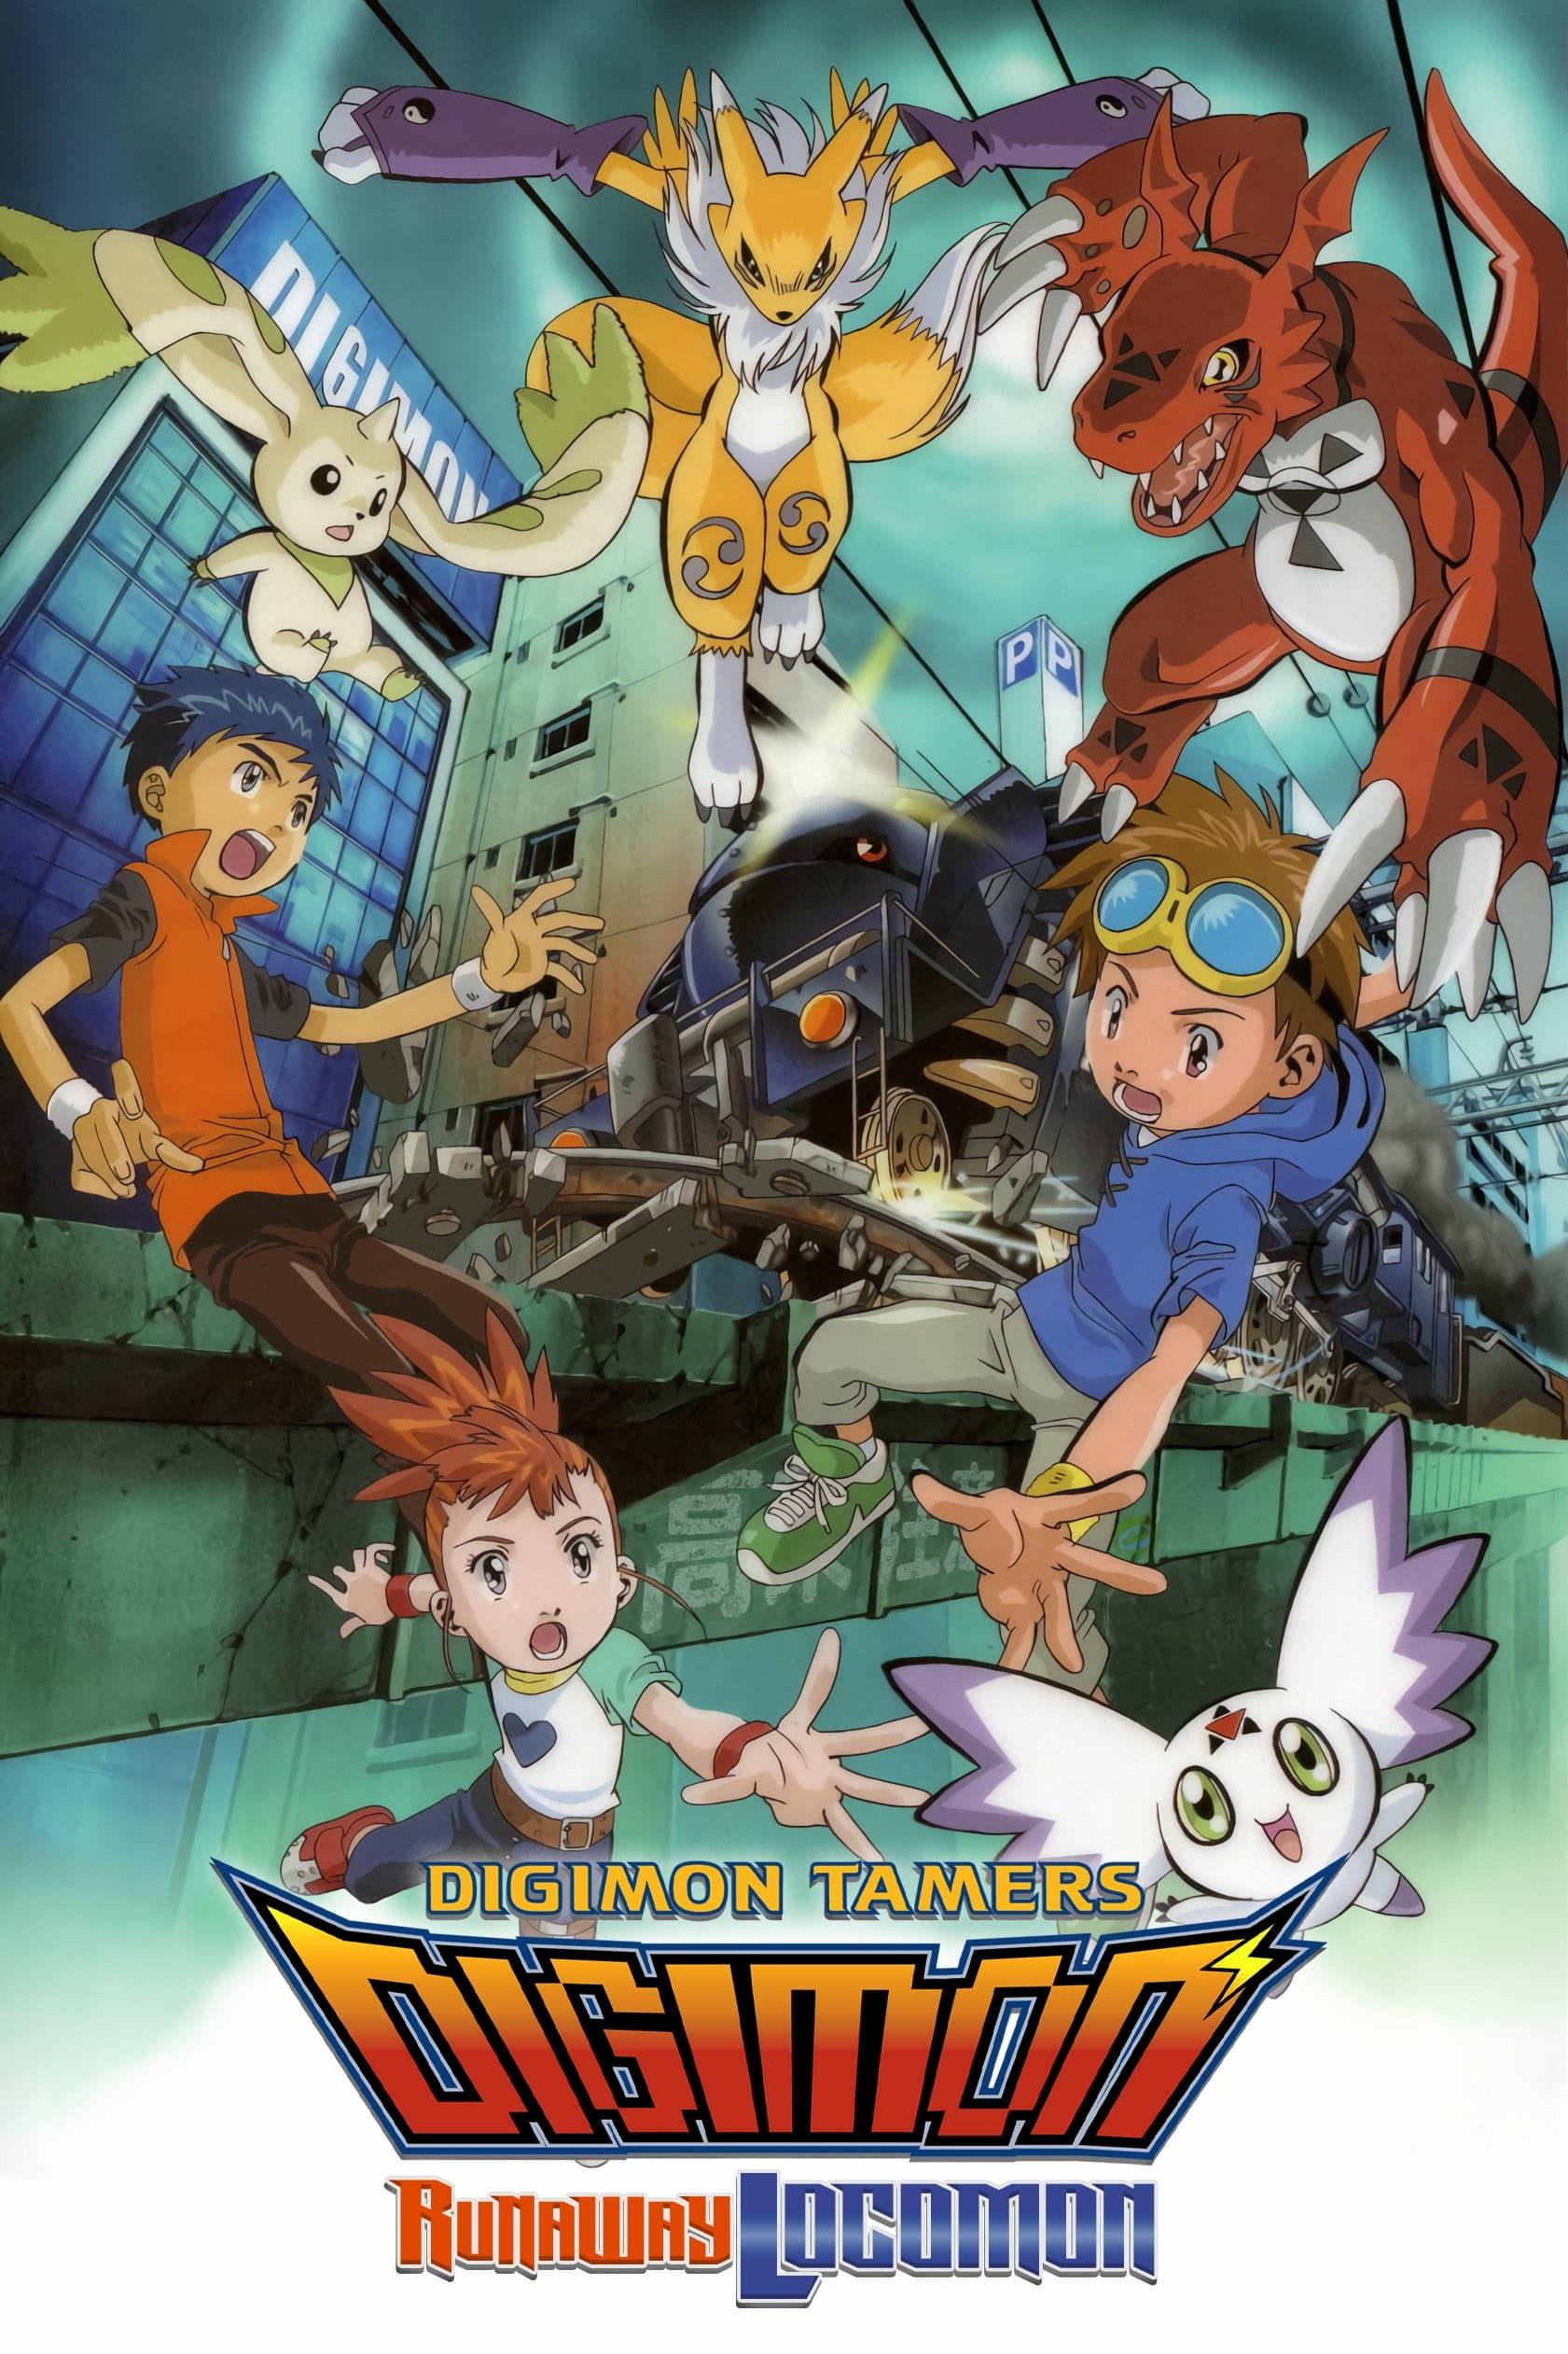 Digimon Tamers - The Runaway Digimon Express